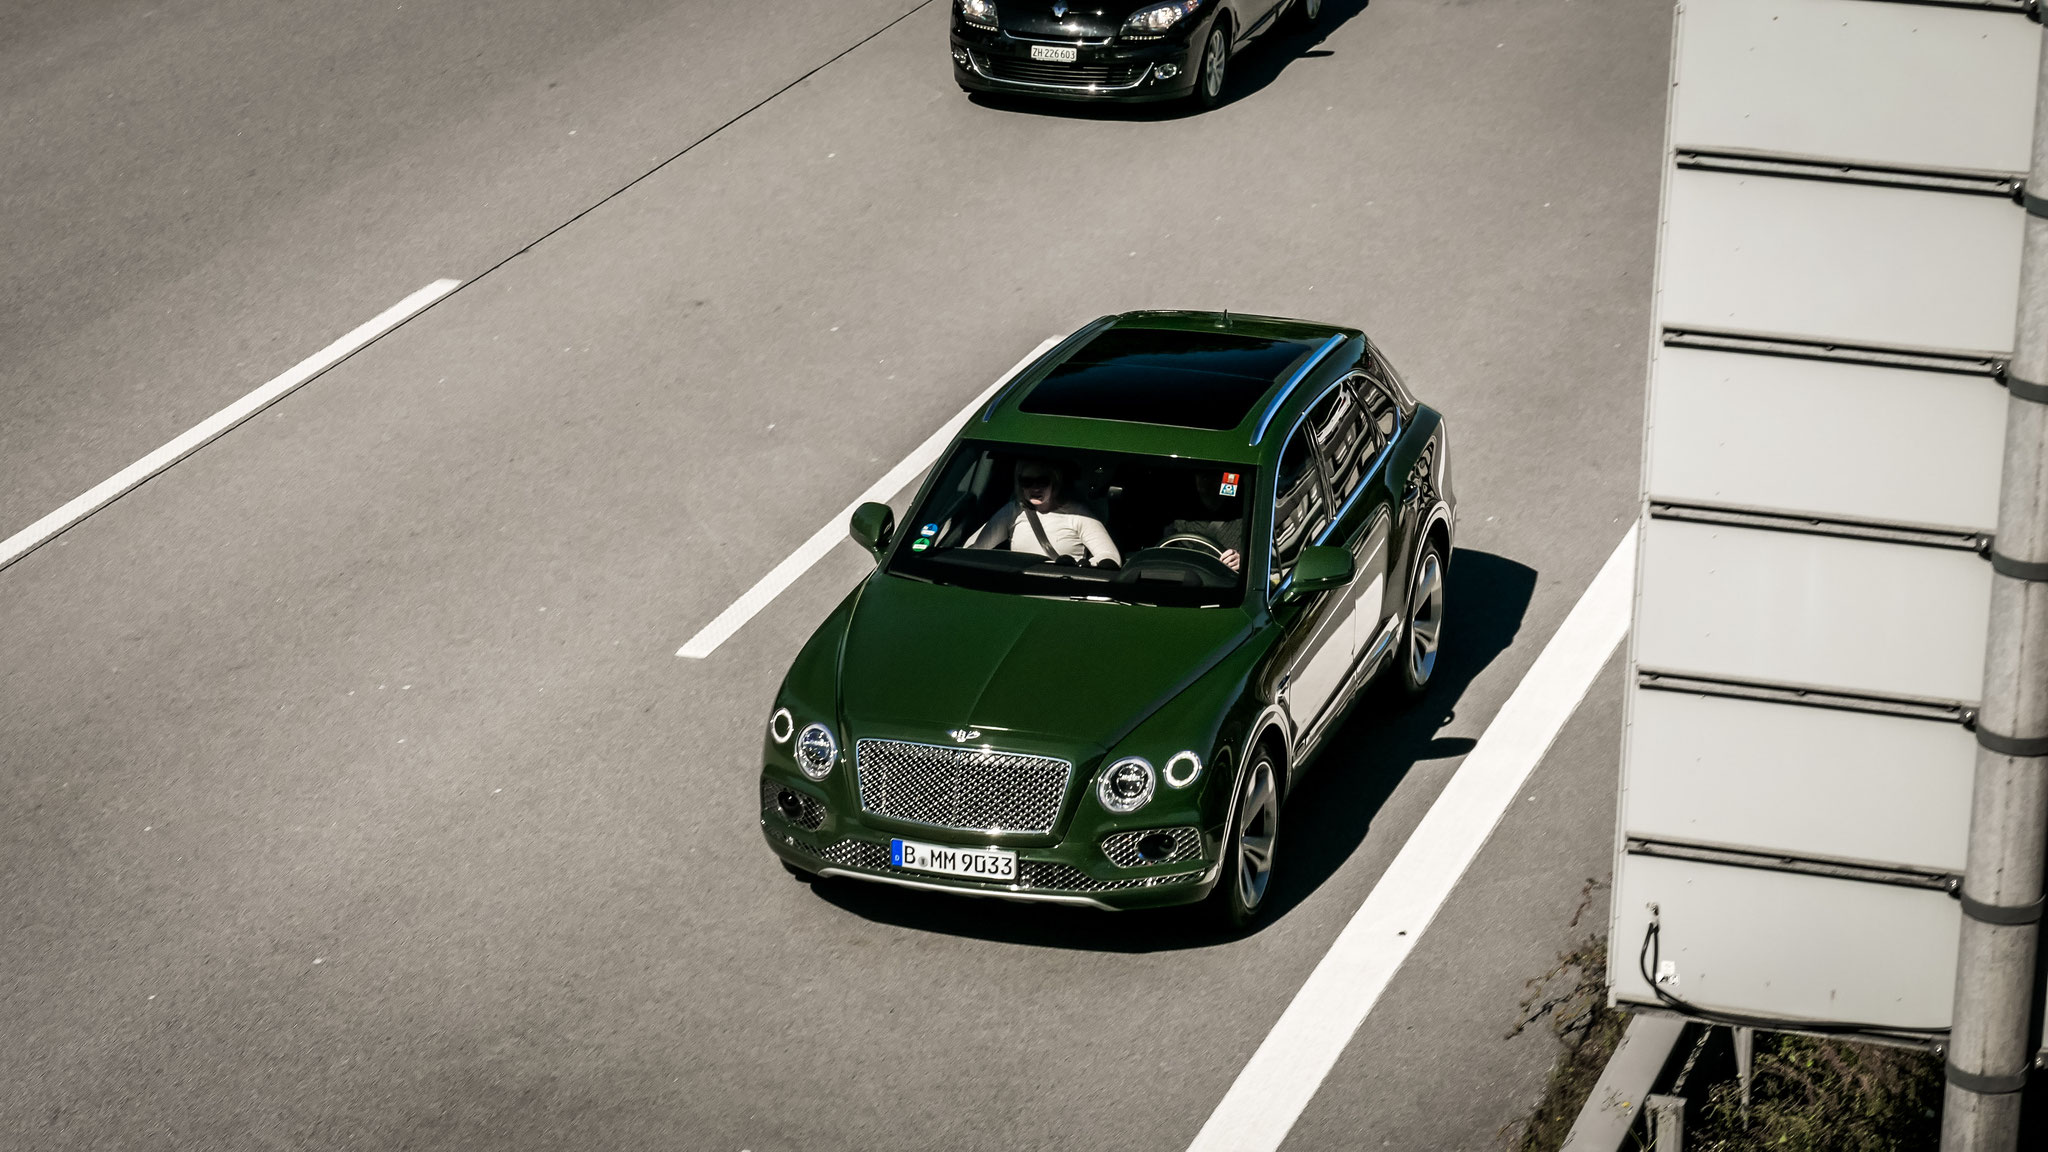 Bentley Bentayga - B-MM-9033